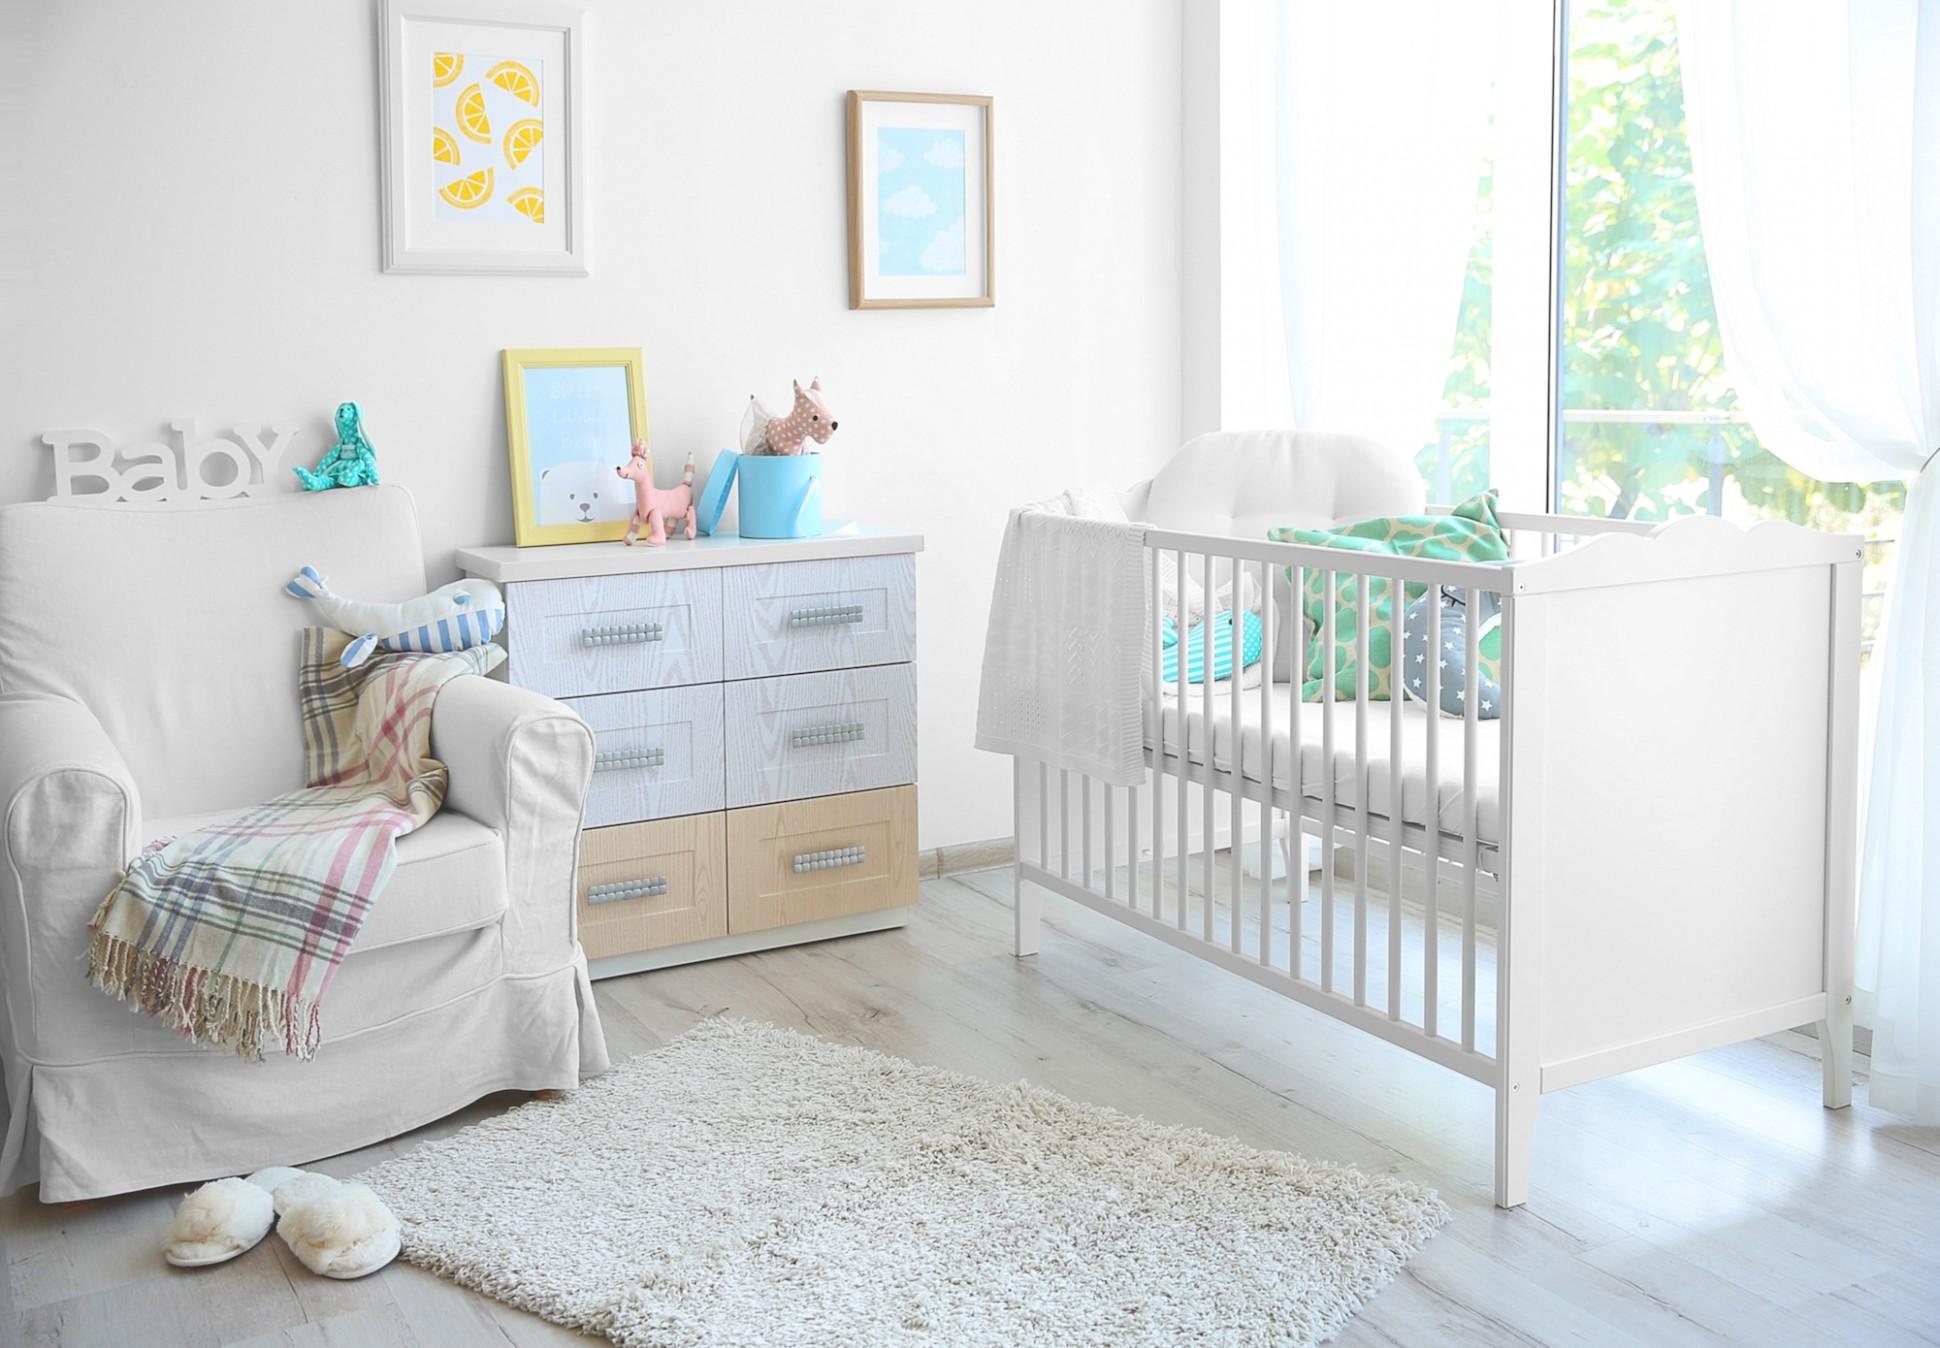 Baby Nursery - Decor & Furniture Ideas  Parents - Baby Room Furniture Ideas